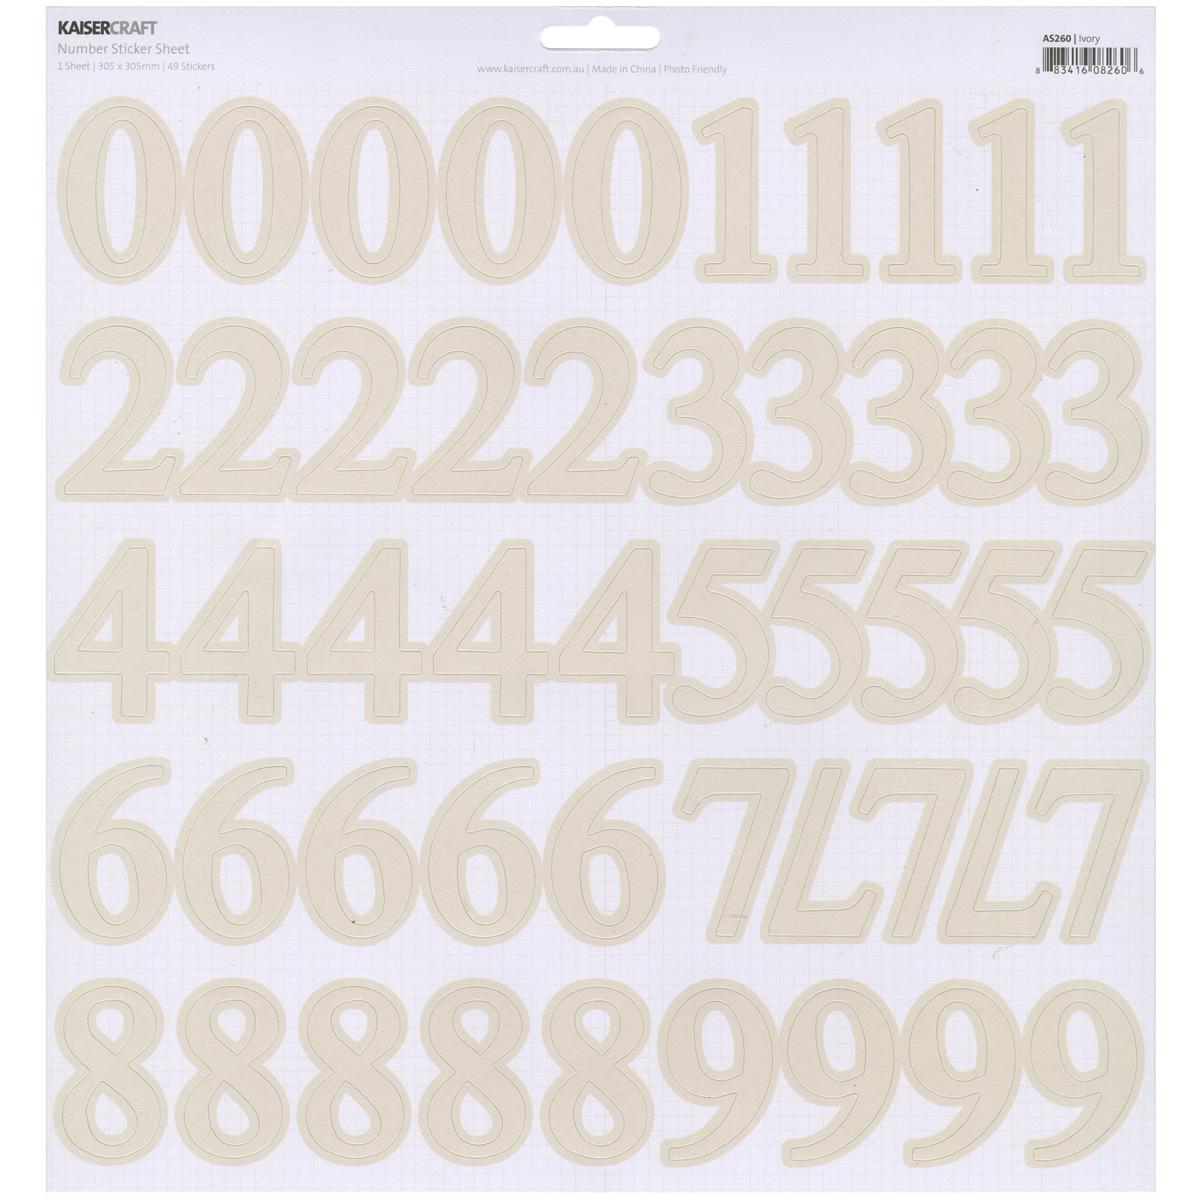 Ivory 12X12 Number Sticker Sheet